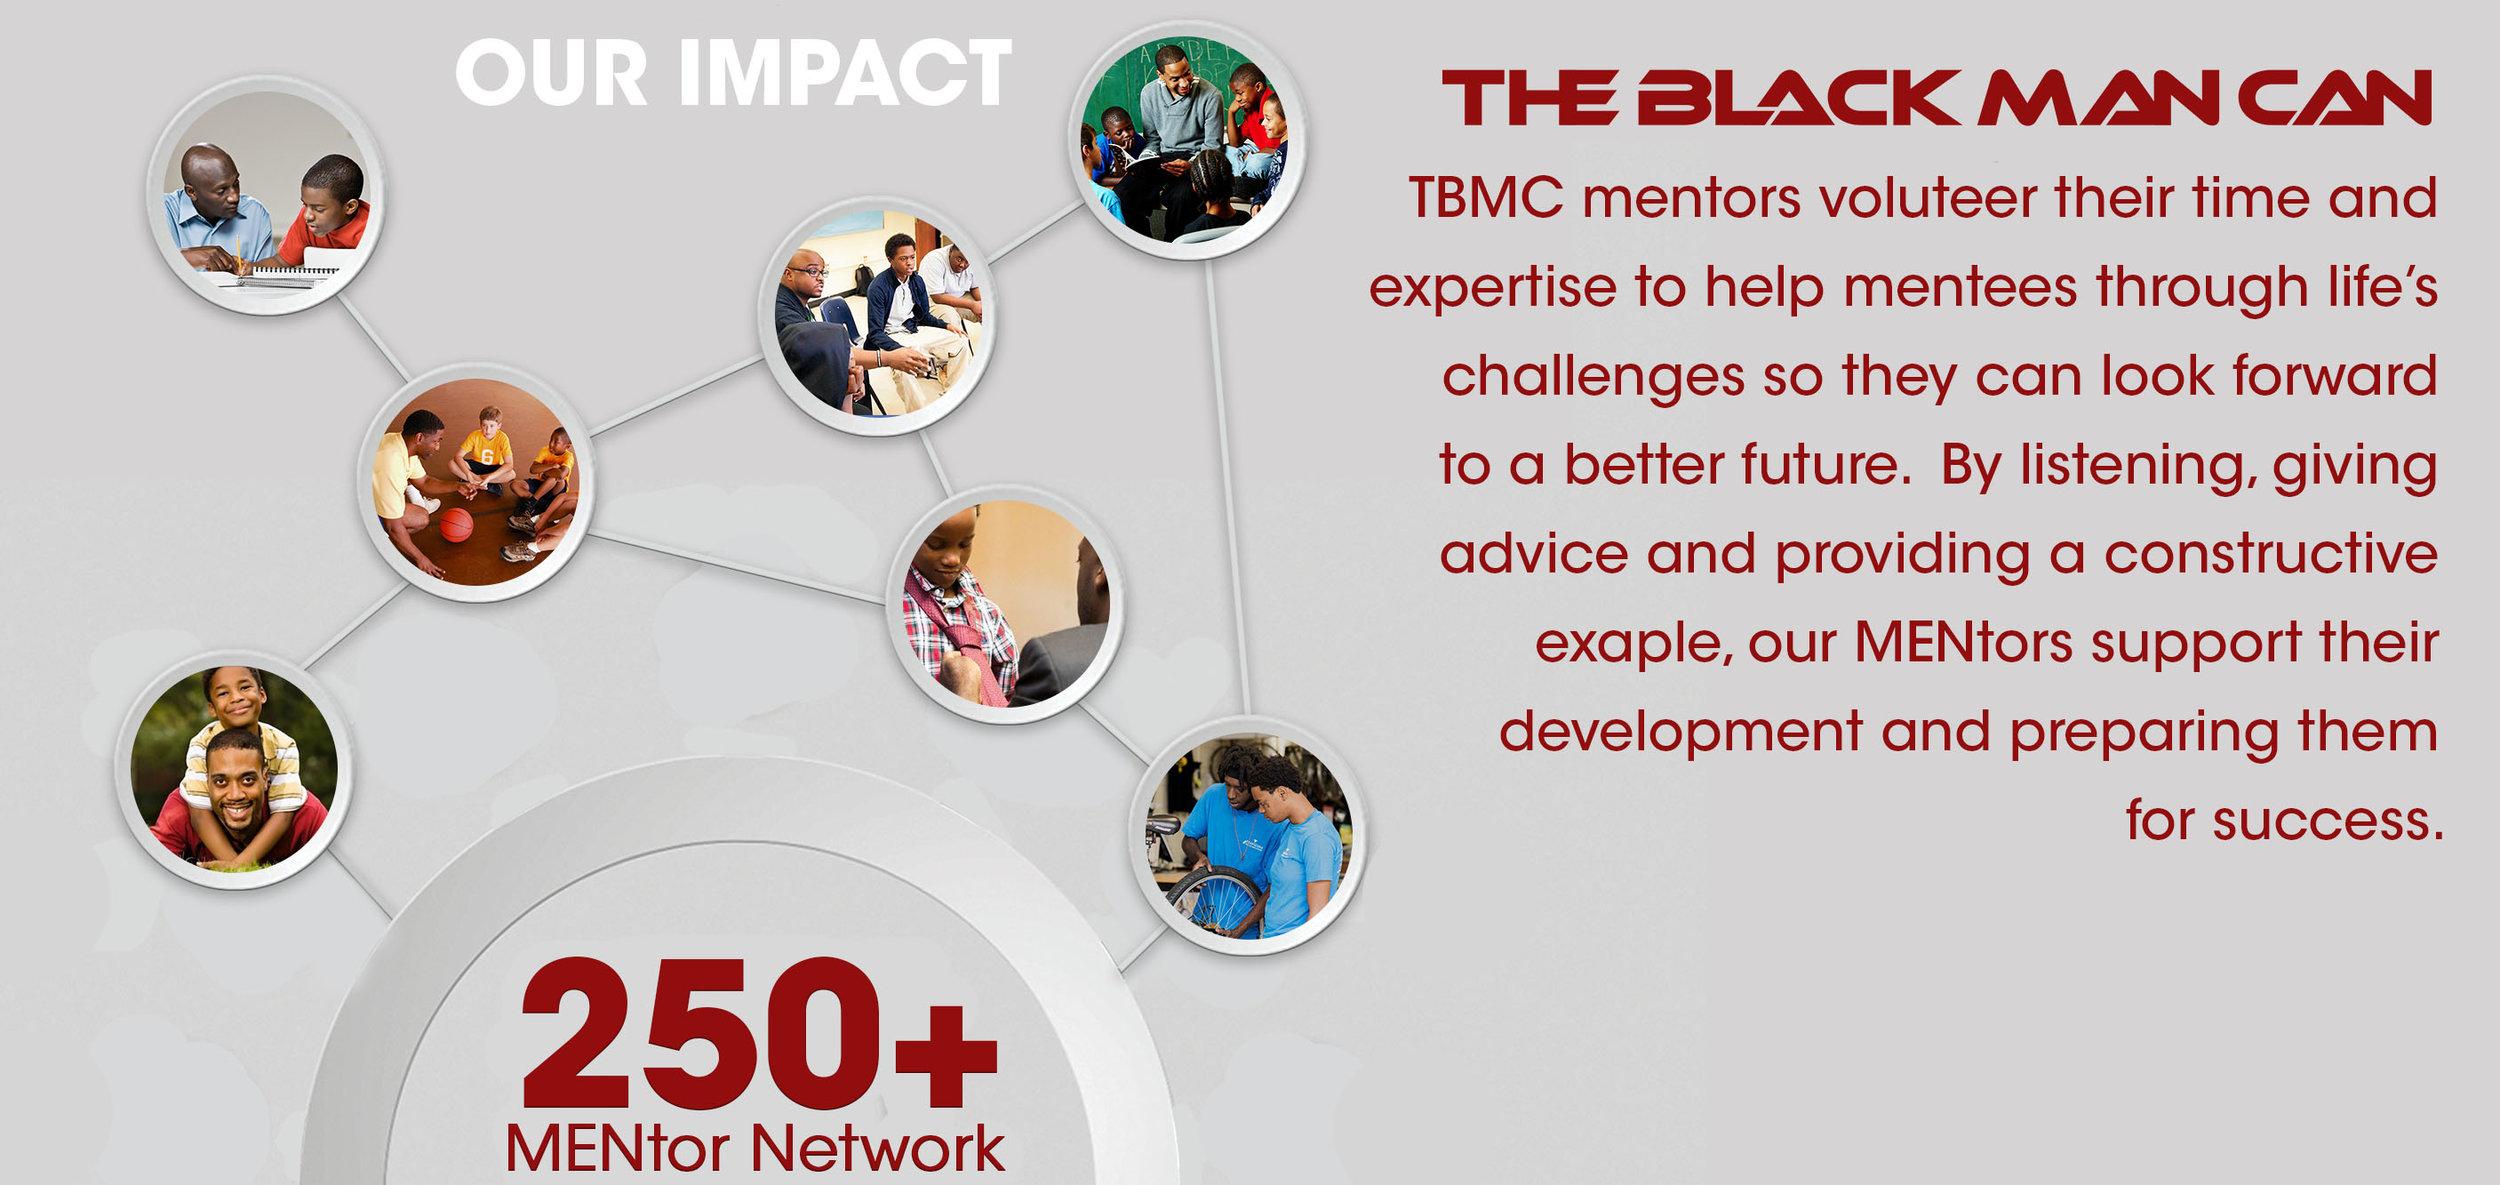 the black man can impact 6.jpg